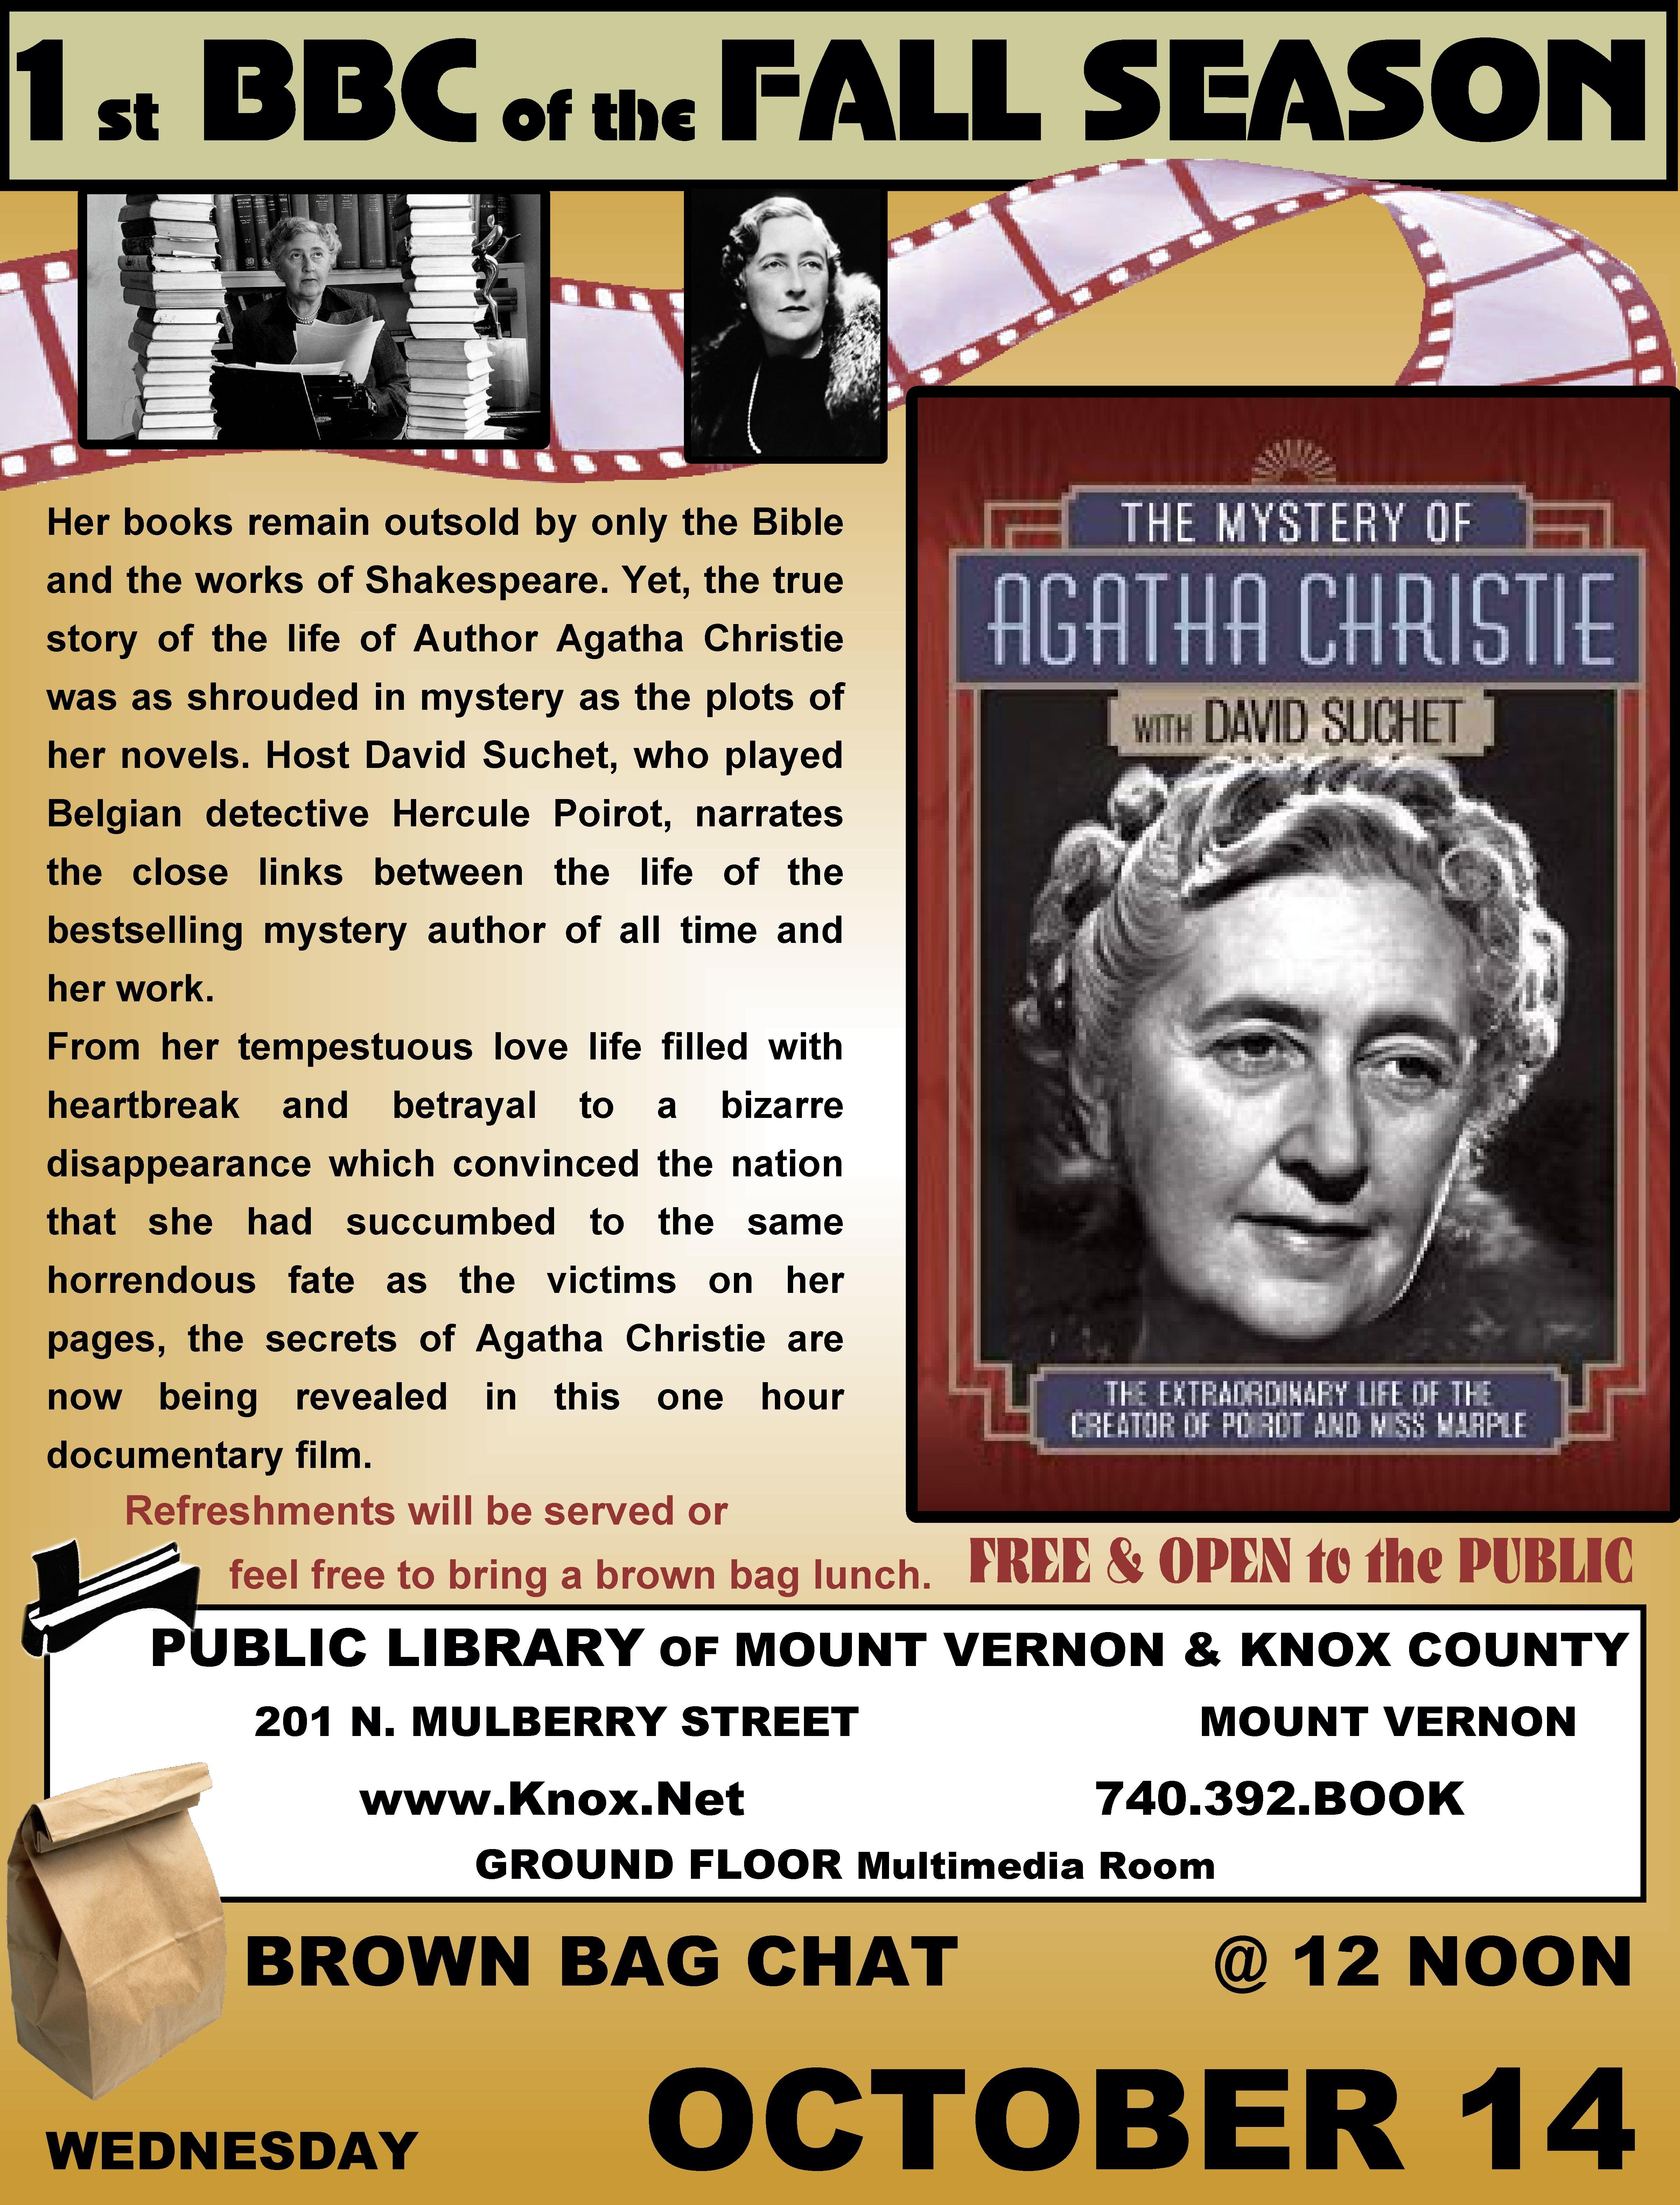 BBC @PLMVKC  The Mystery of Agatha Christie with David